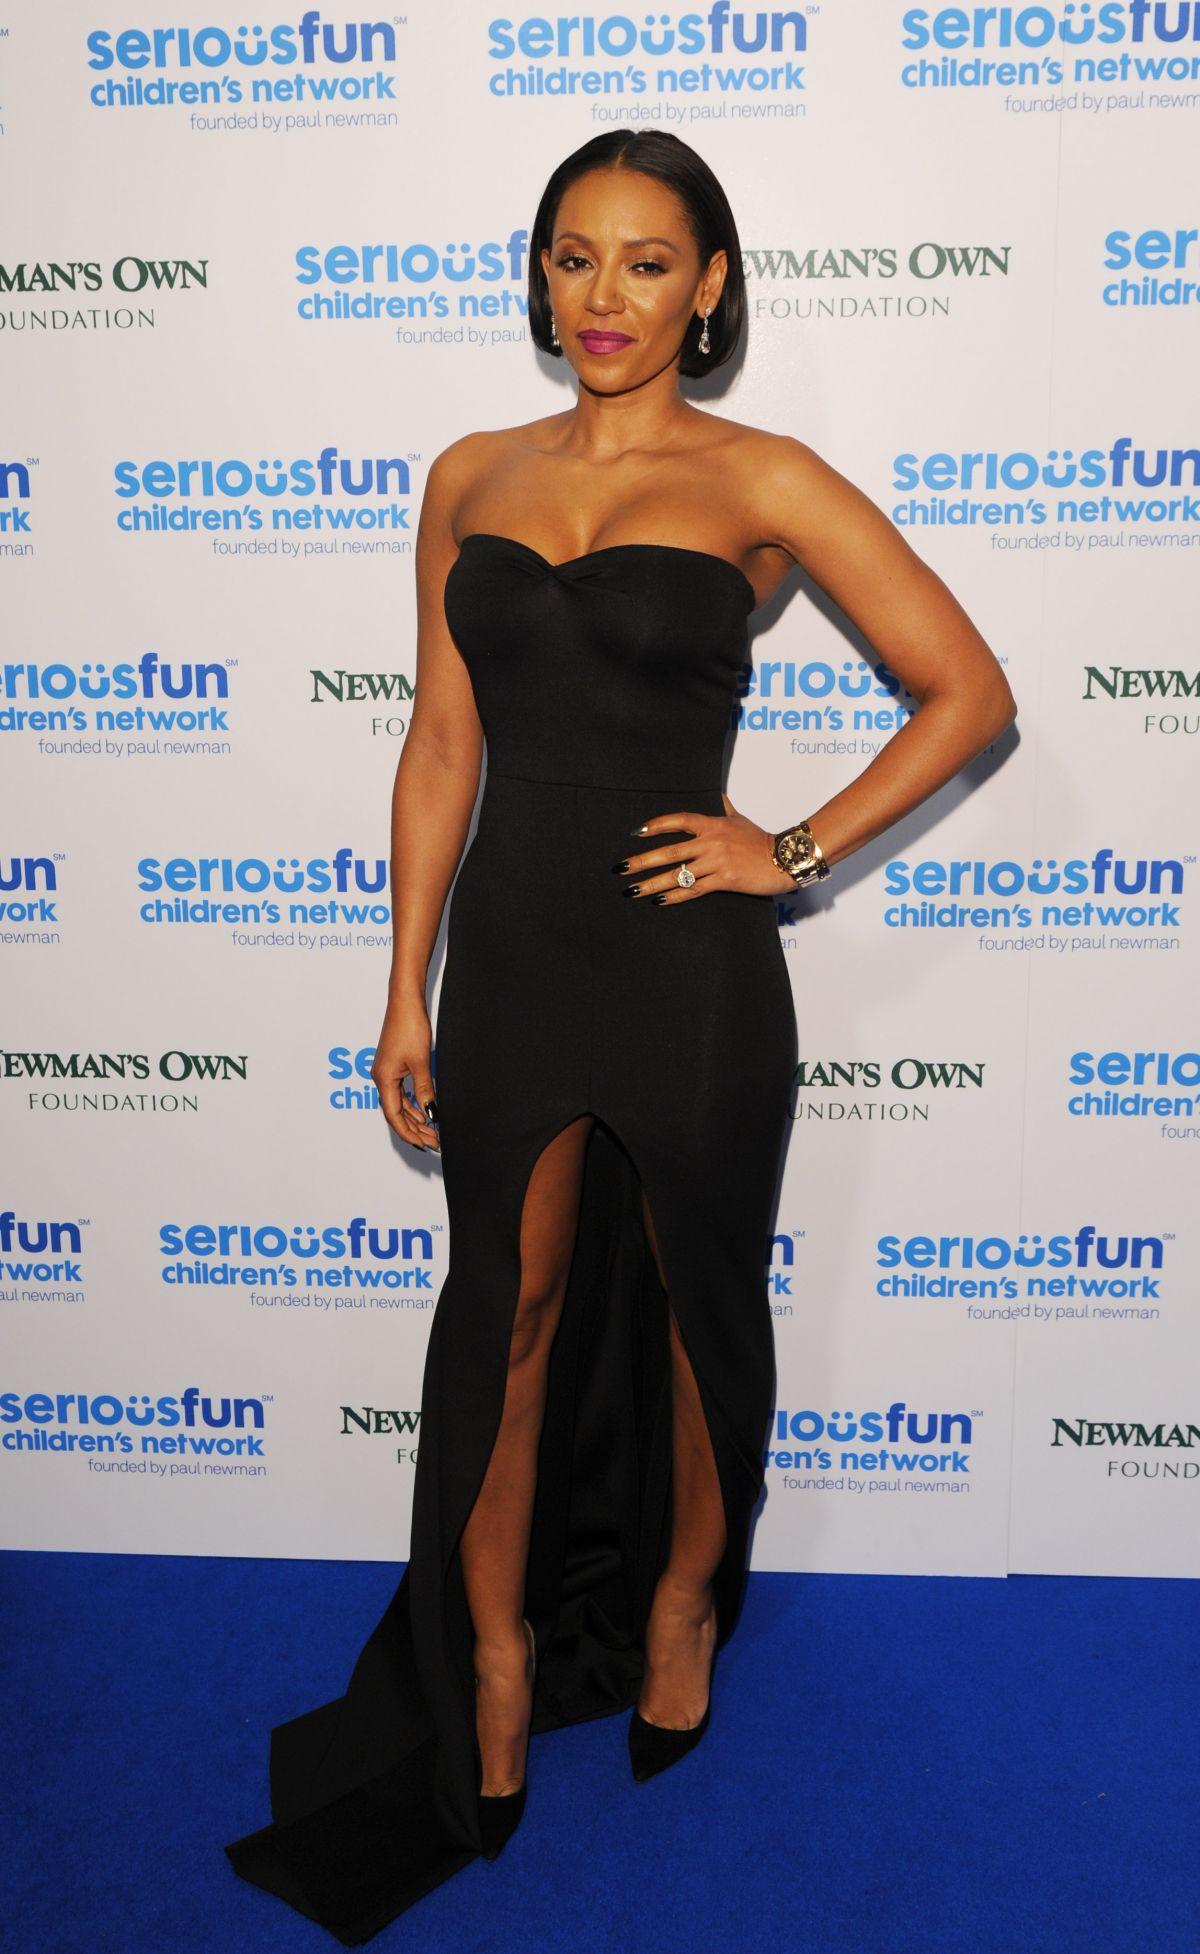 MELANIE BROWN at Seriousfun Gala in London